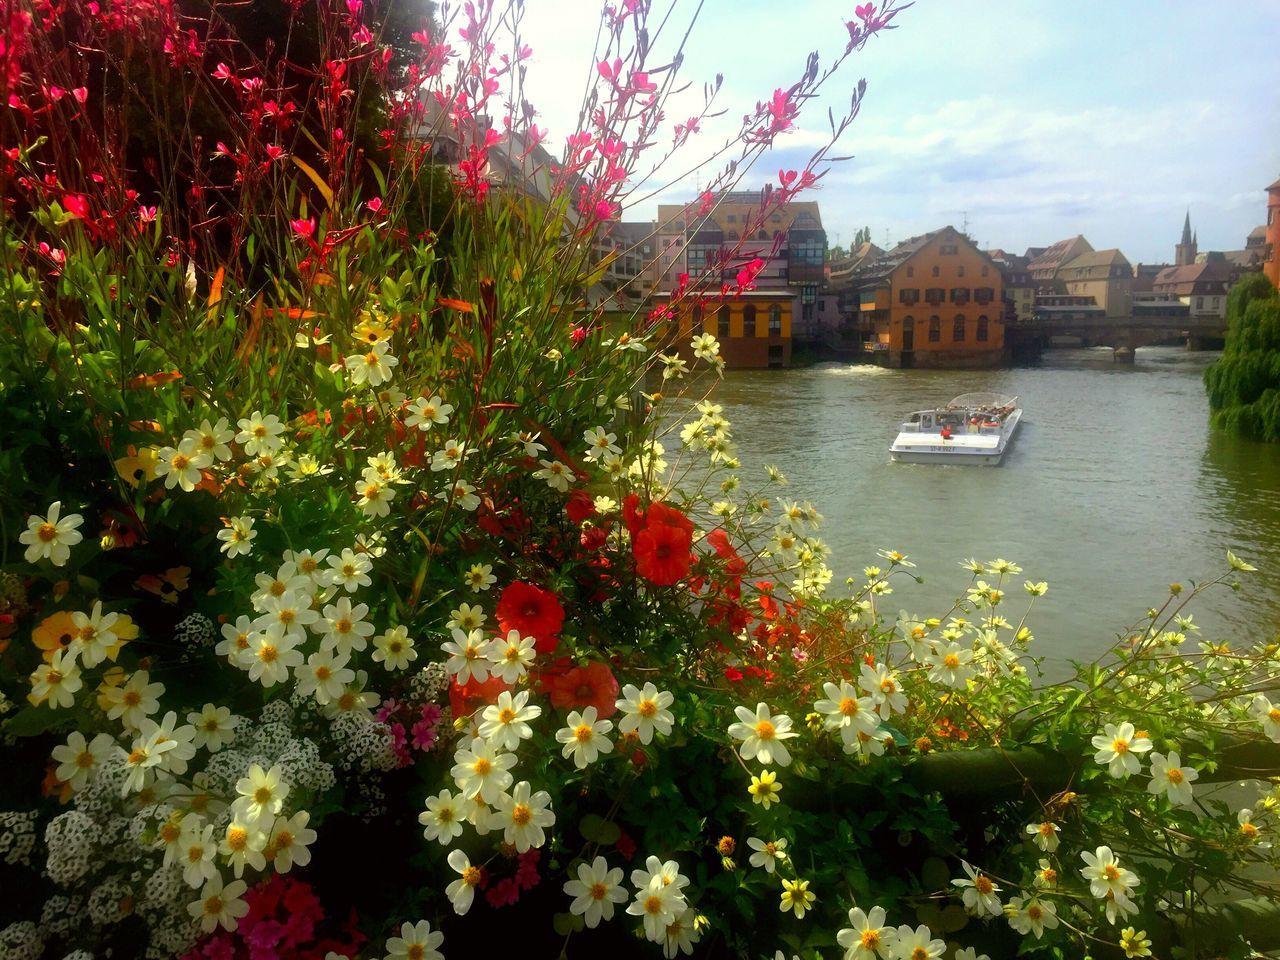 Flowers Enjoying Life Nature Life France Seyehat Fransa Nehir Rems Tourism Tourist Gezinti Tarihi Tarih  History